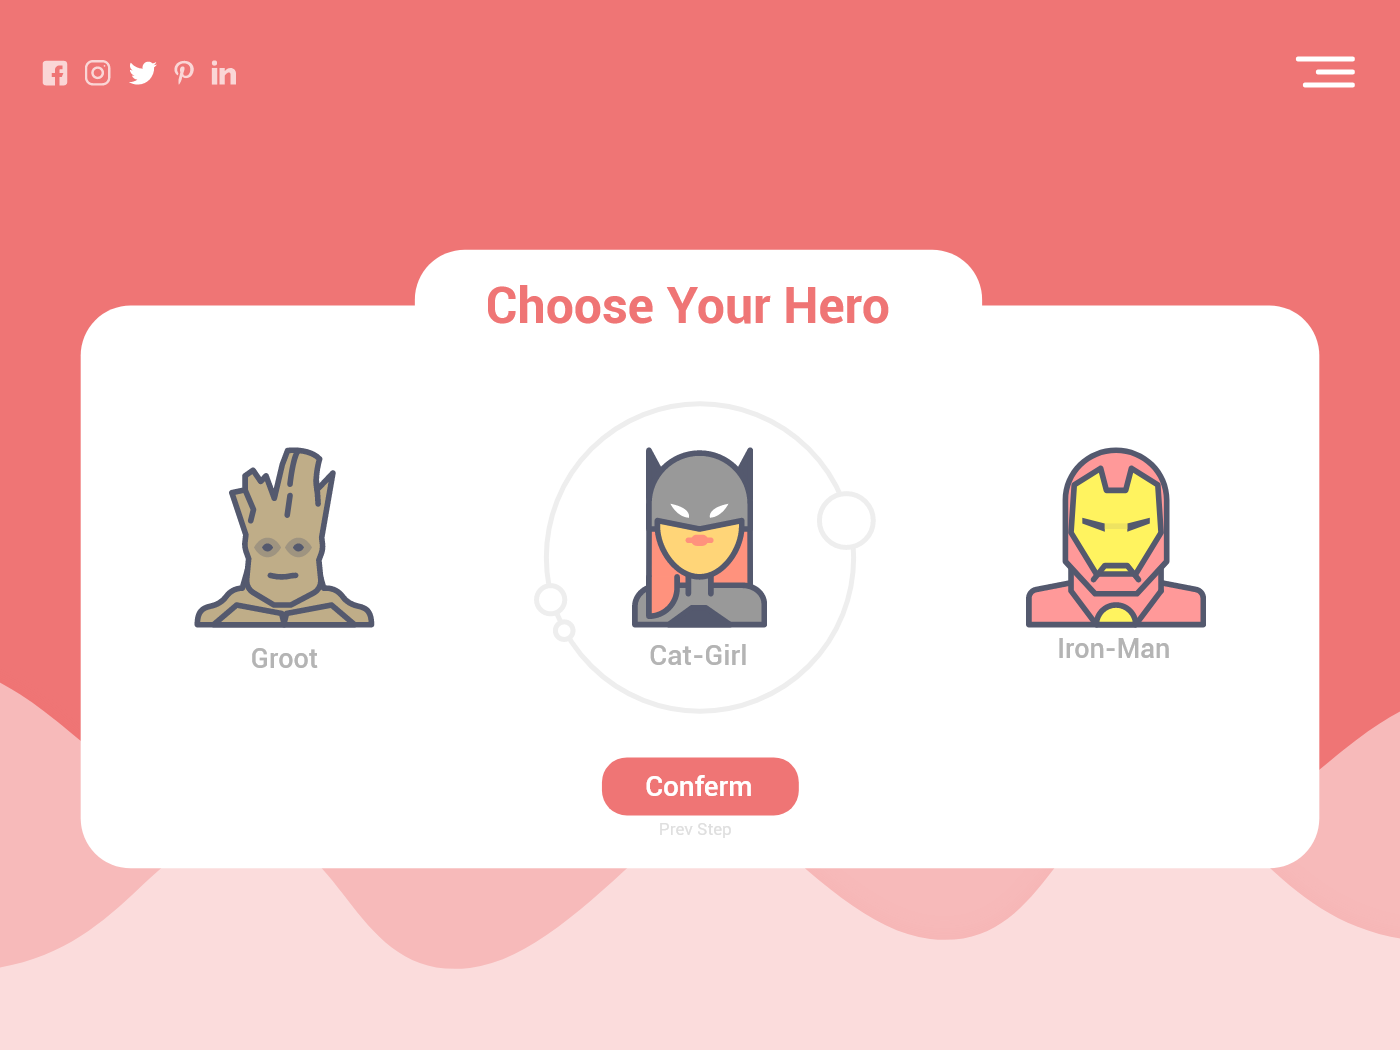 Choose Hero heroes choose web app web application ui design 100 ui design challenge 100 day ui challenge 100 day project vector illustration